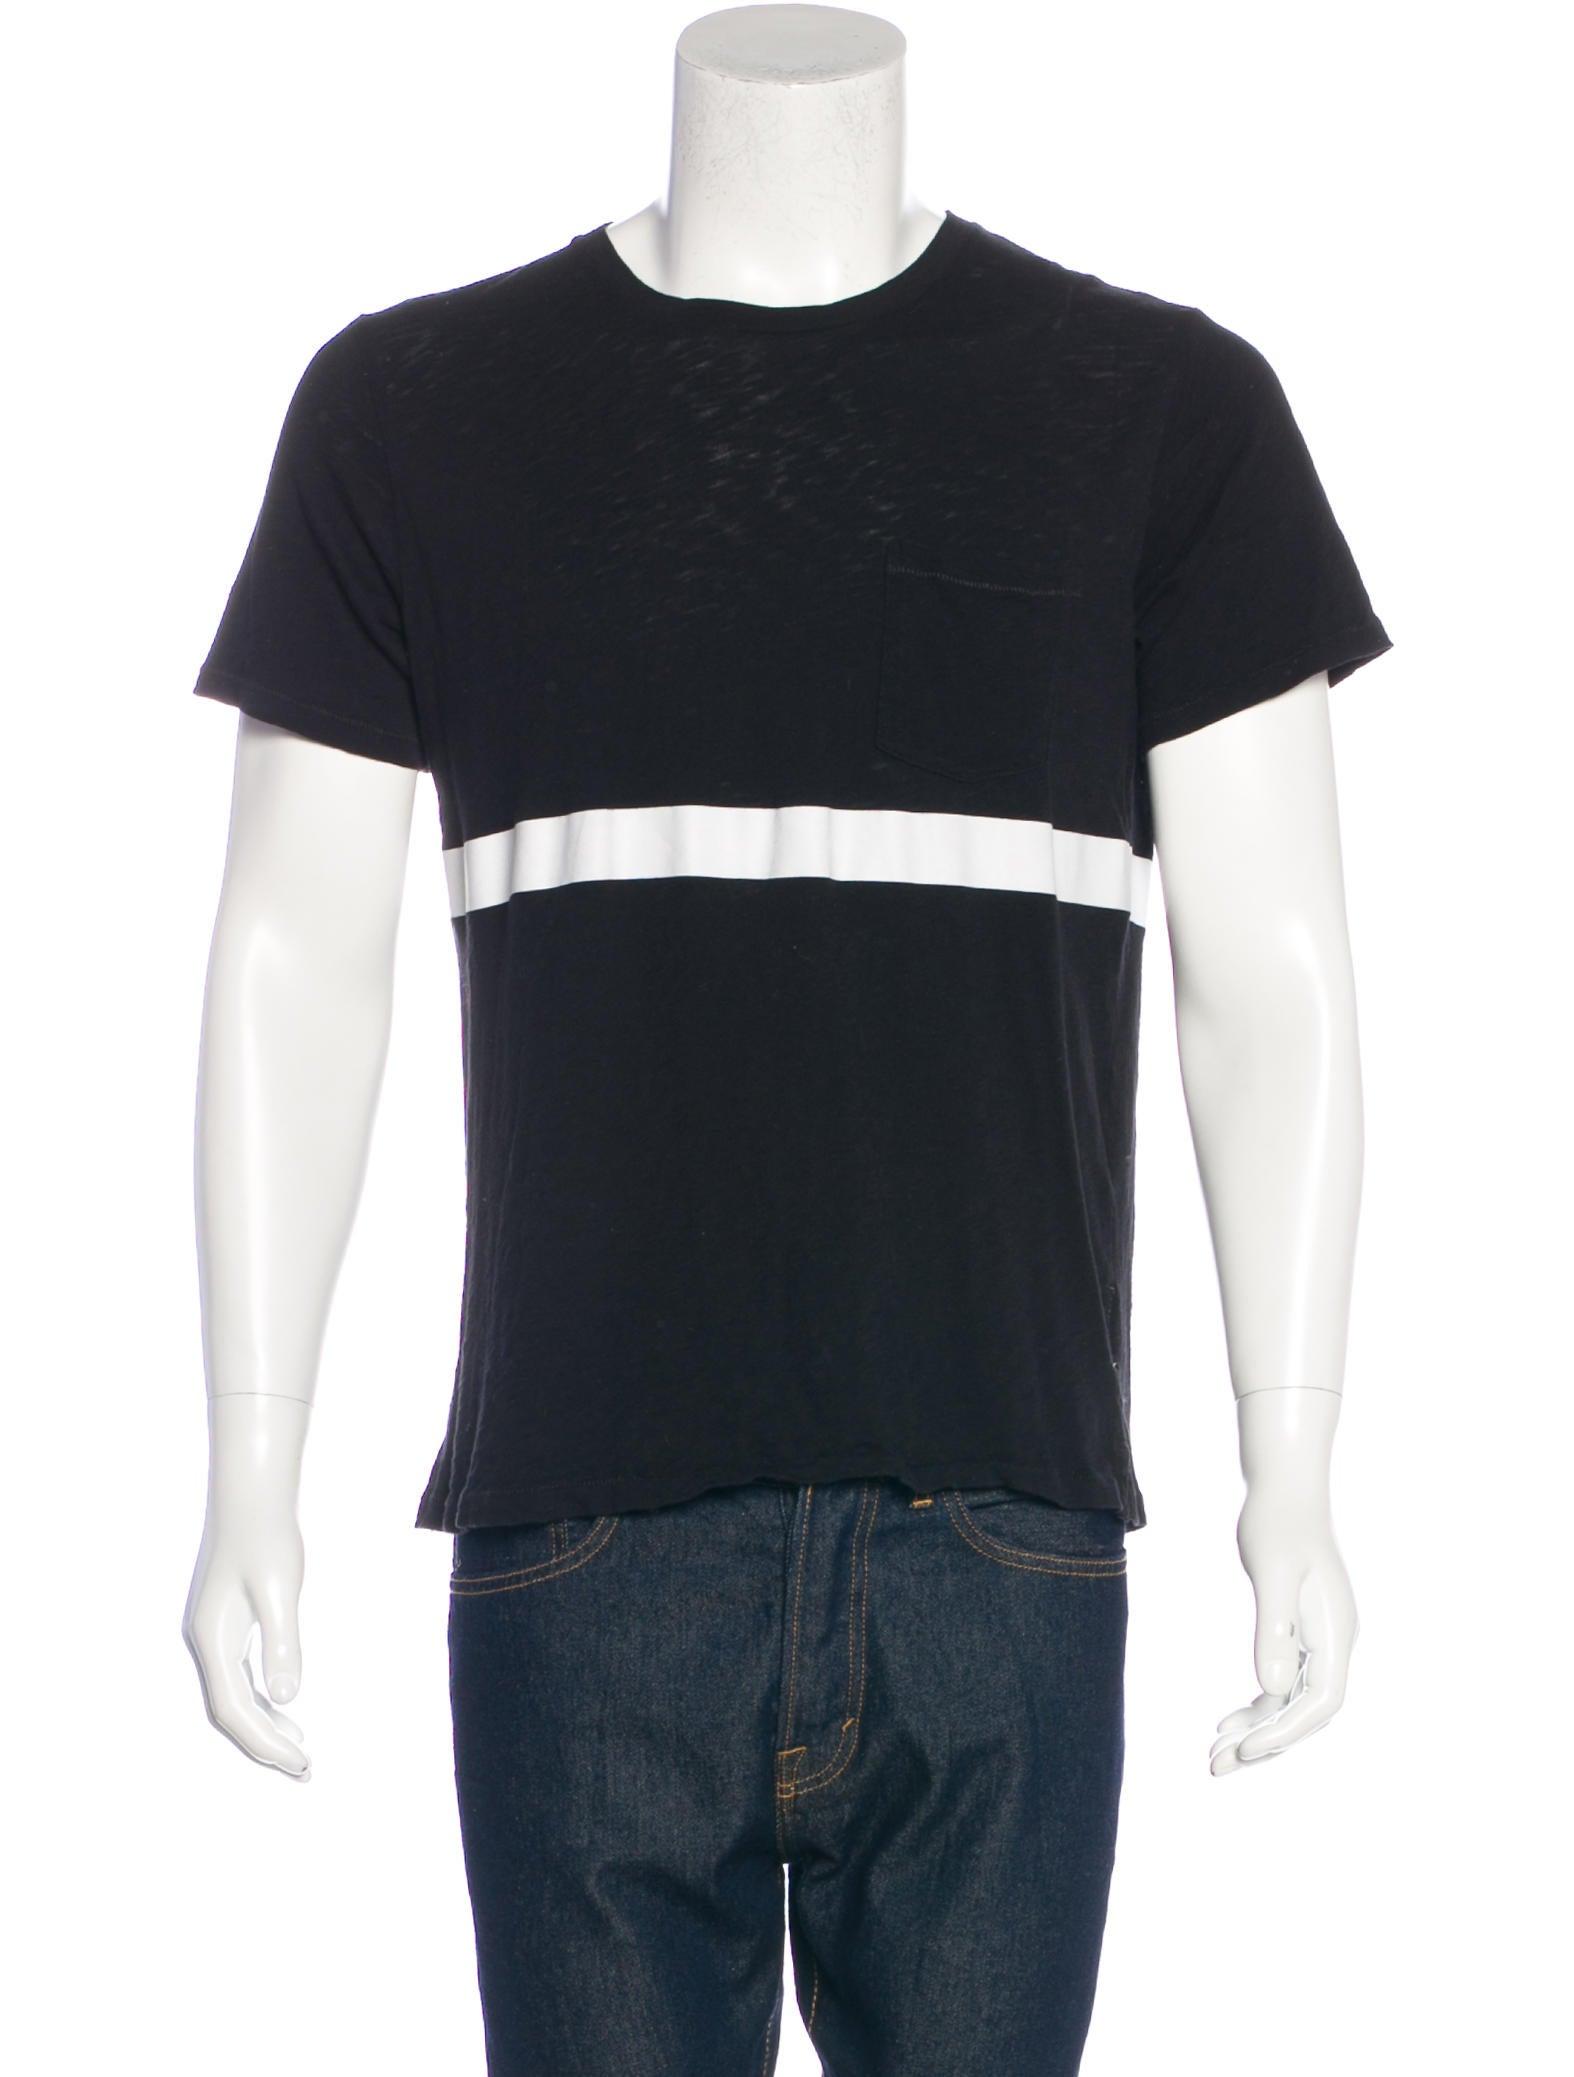 Rag Bone Striped Crew Neck T Shirt Clothing